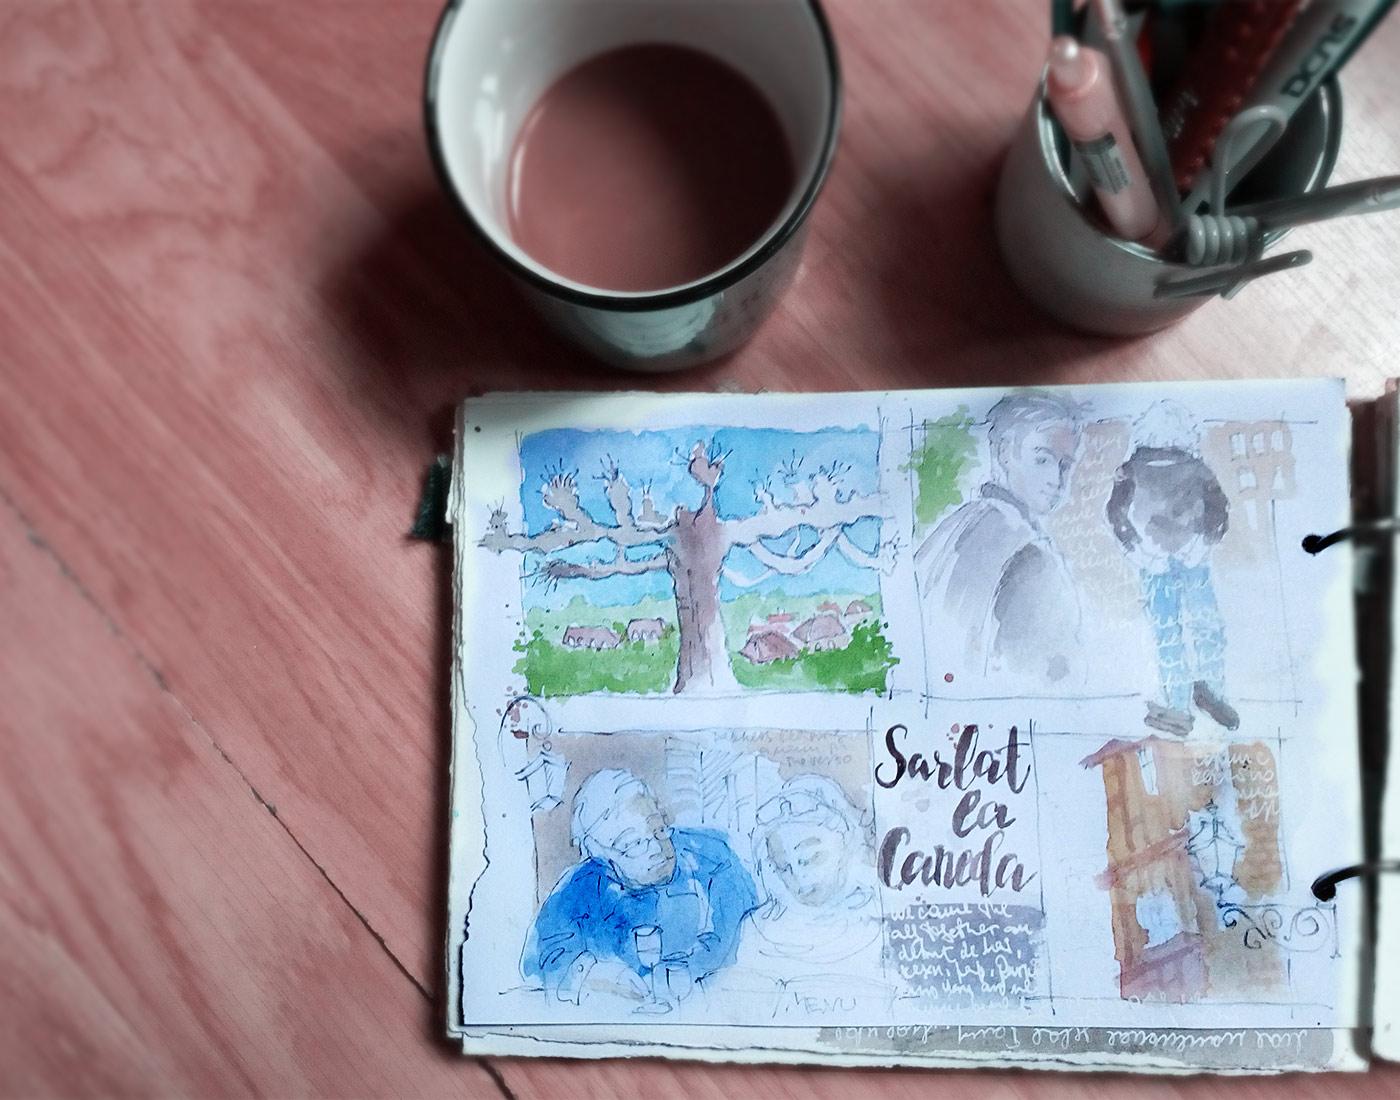 Sarlat-la-Caneda- Album